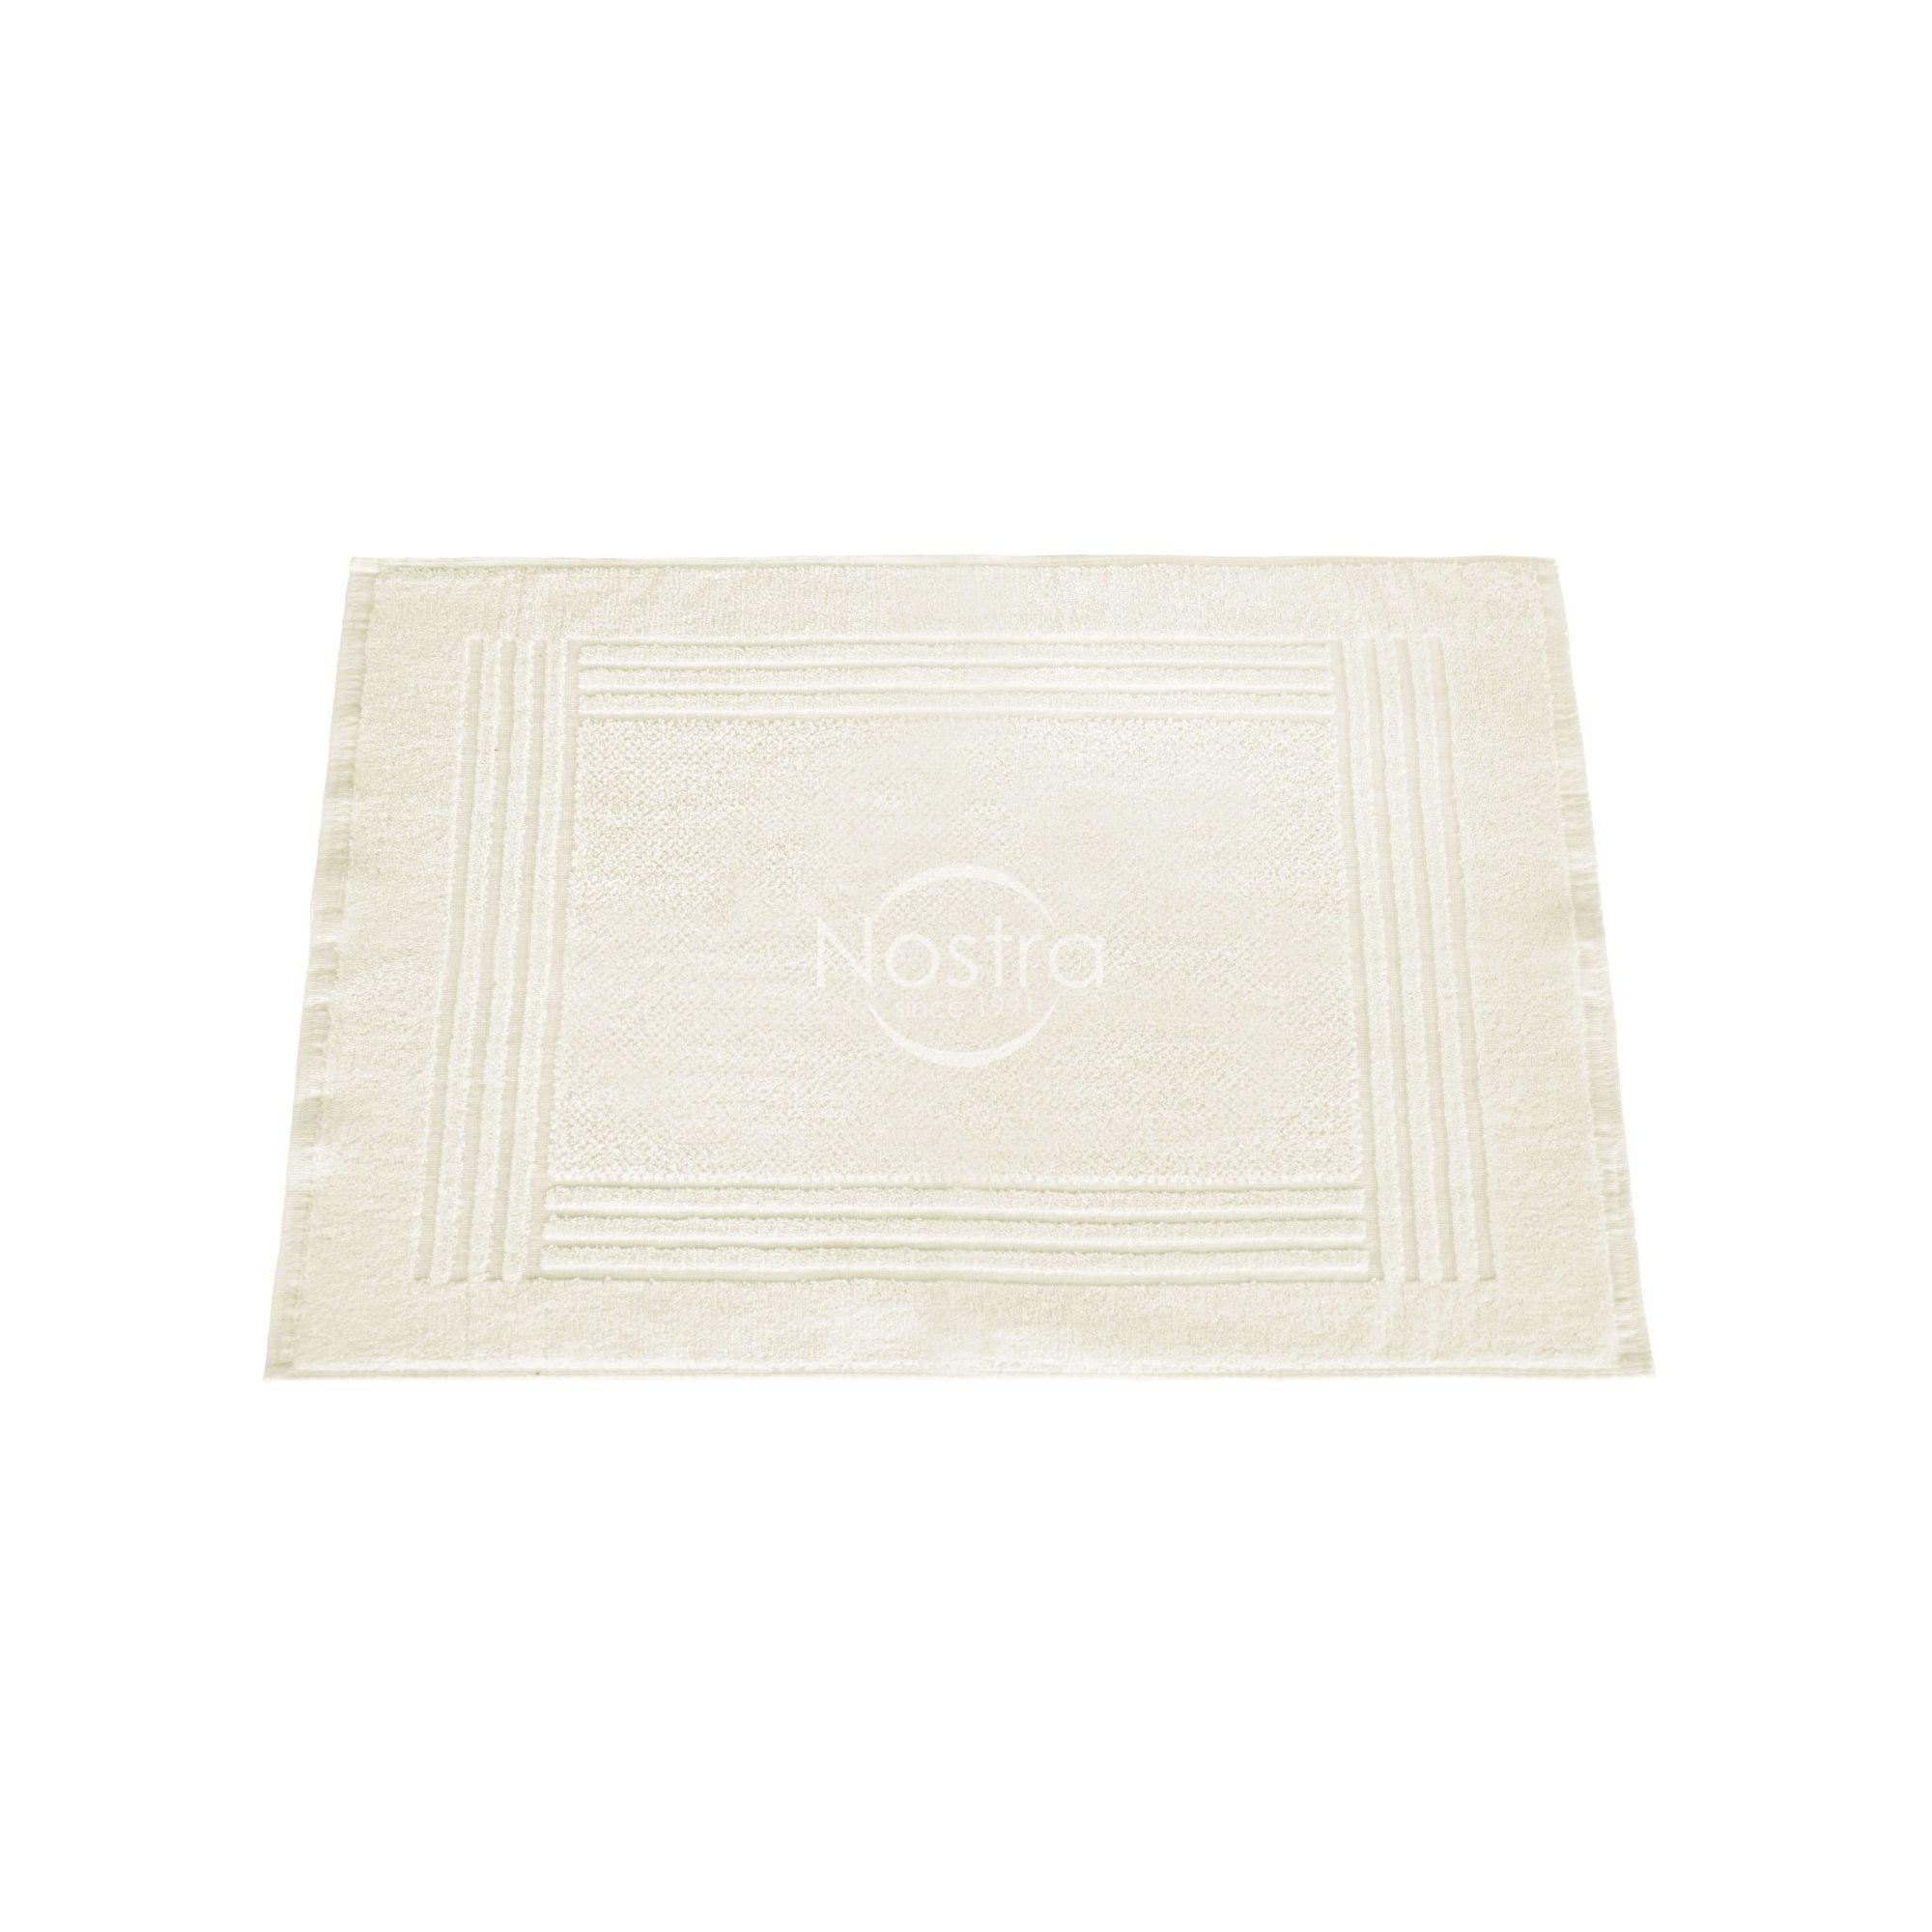 Frotinis vonios kilimėlis 650 650-T0033-IVORY 50x70 cm